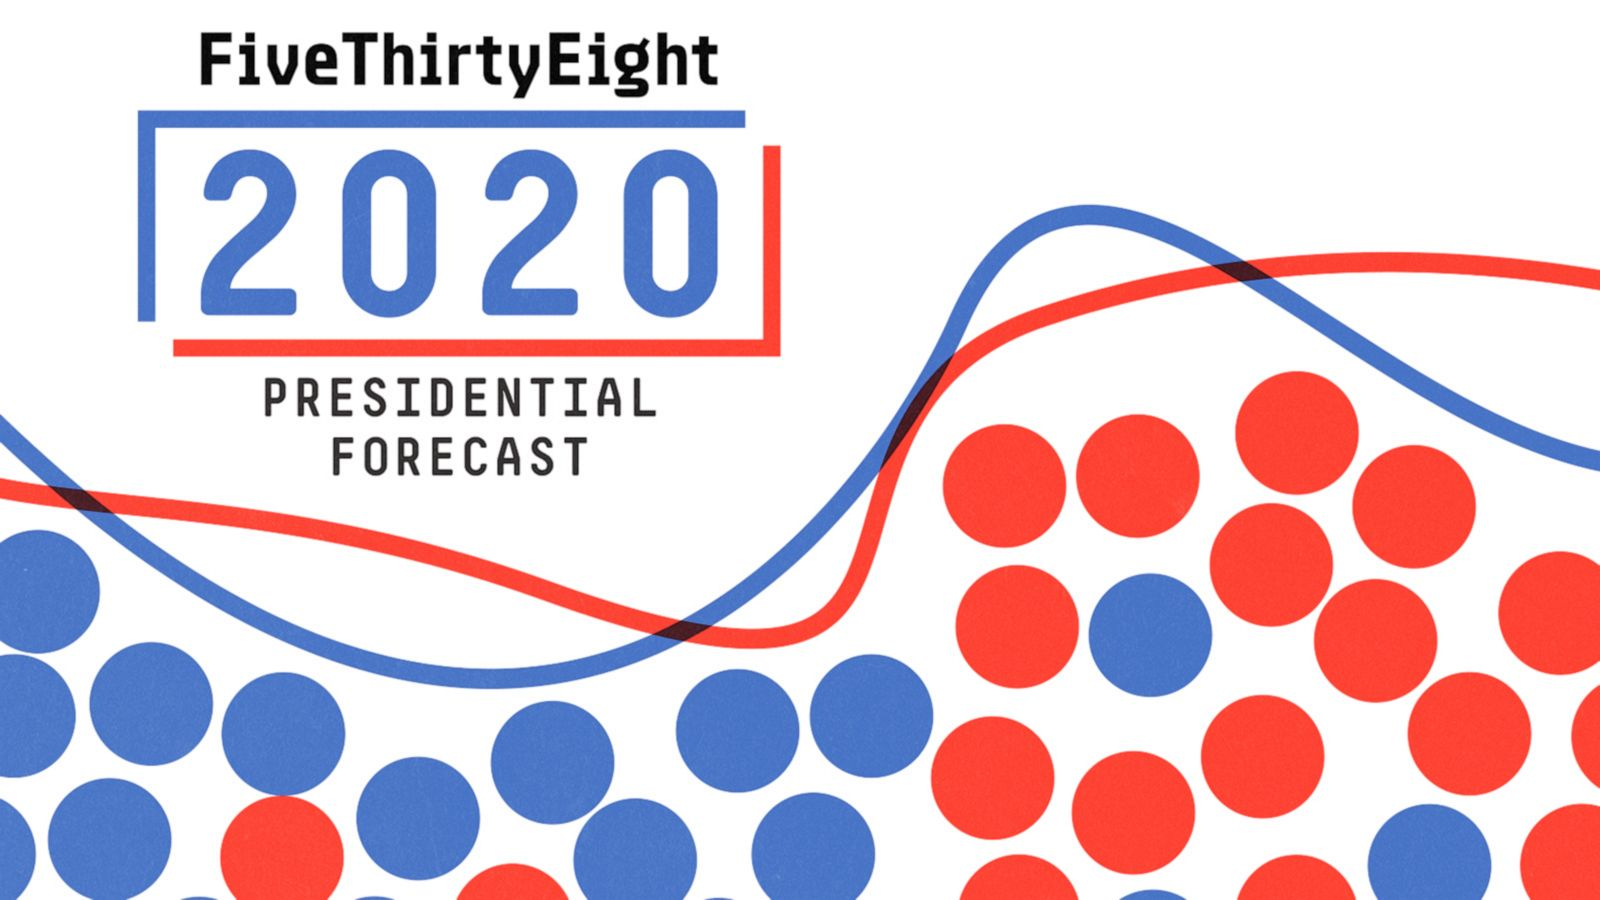 Model Talk: How the 2020 presidential forecast works | FiveThirtyEight